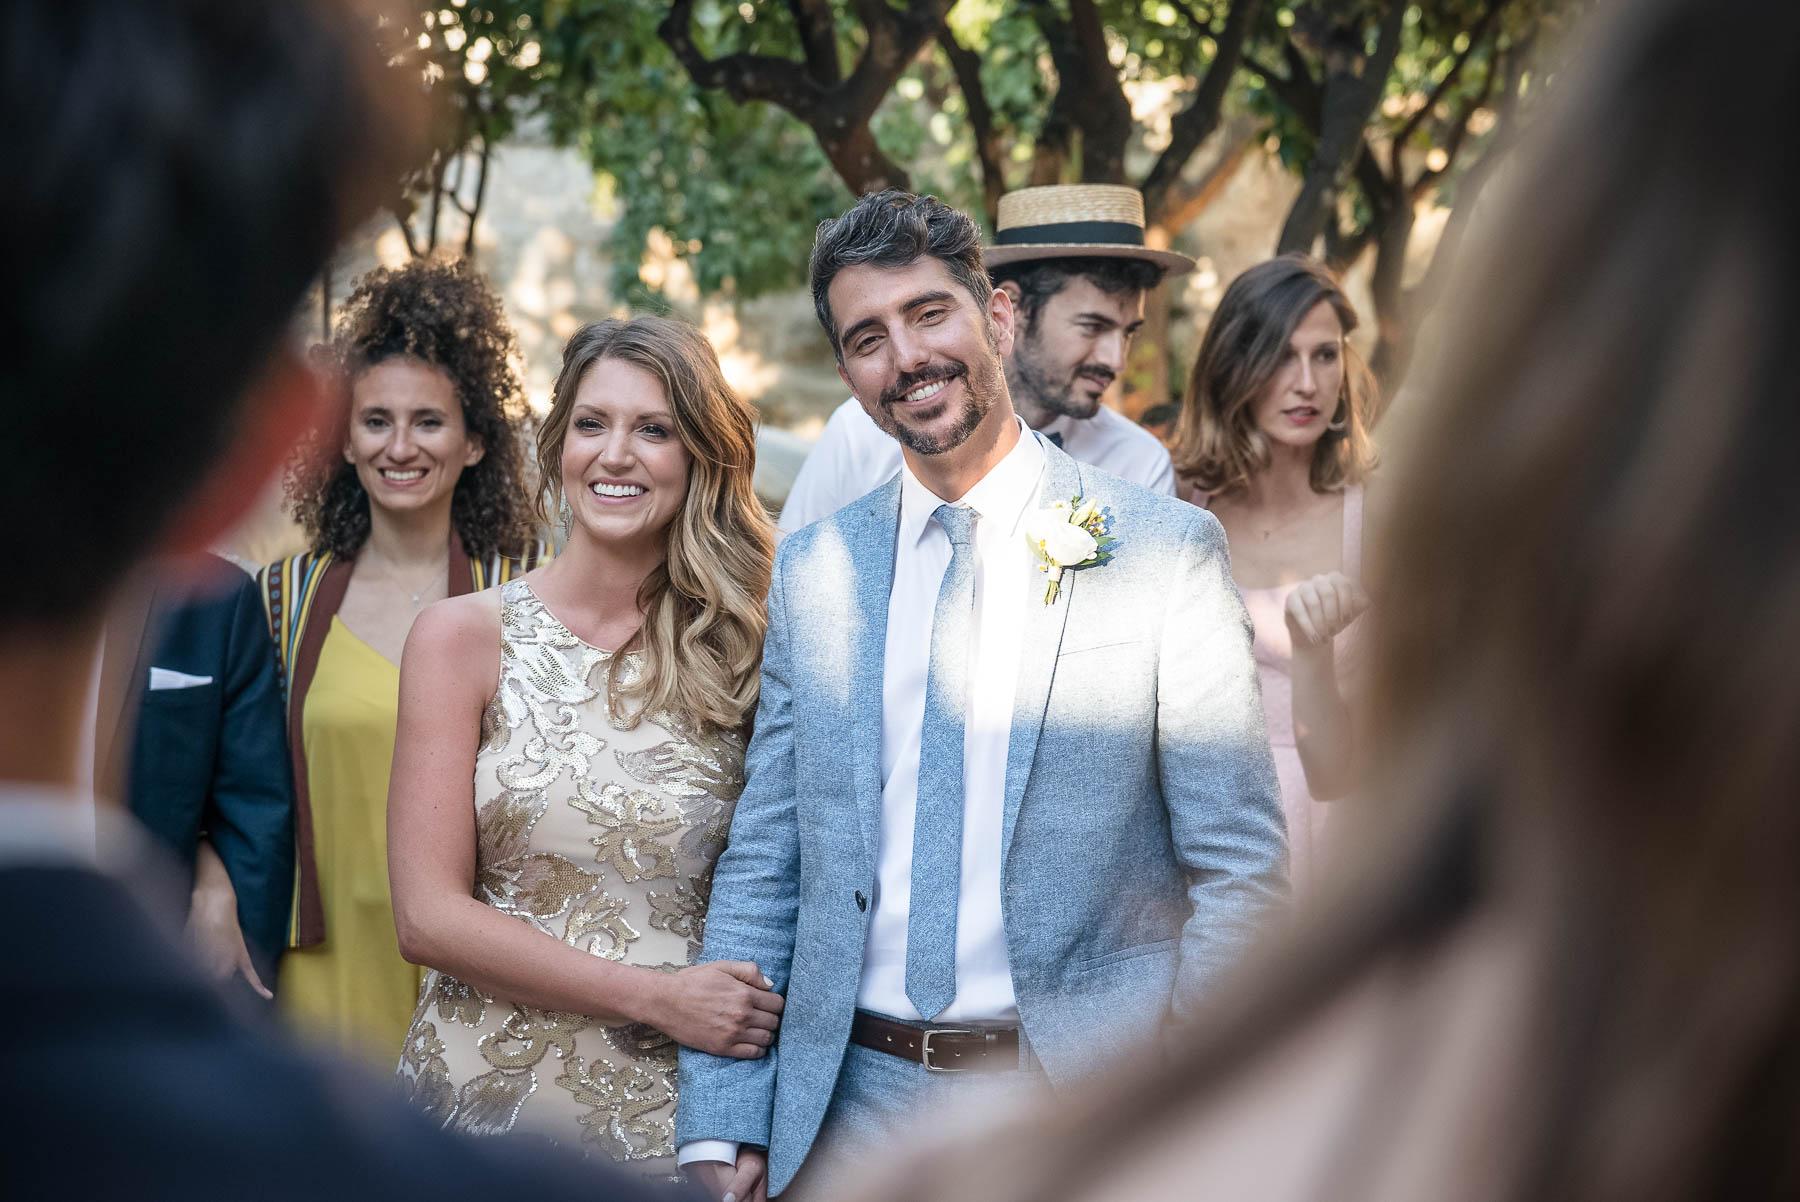 wedding palazzo daniele apulia 13.jpg